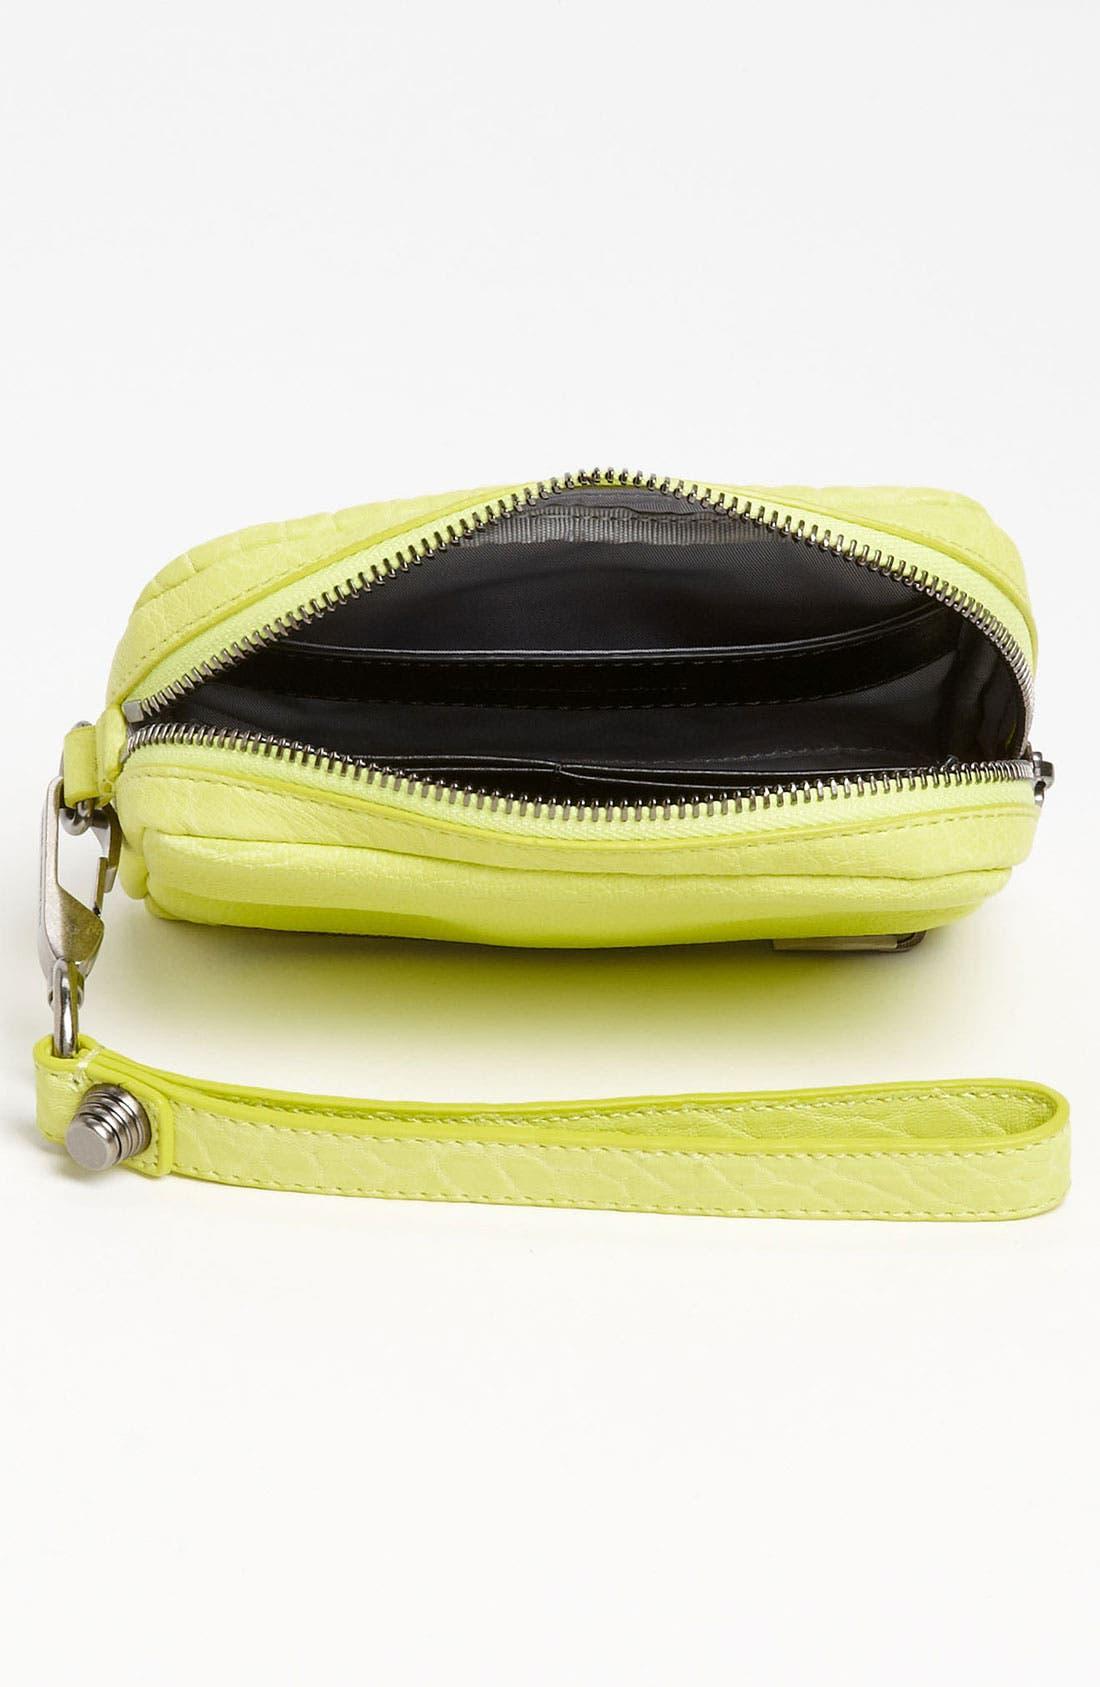 Alternate Image 3  - Alexander Wang 'Fumo' Leather Wristlet